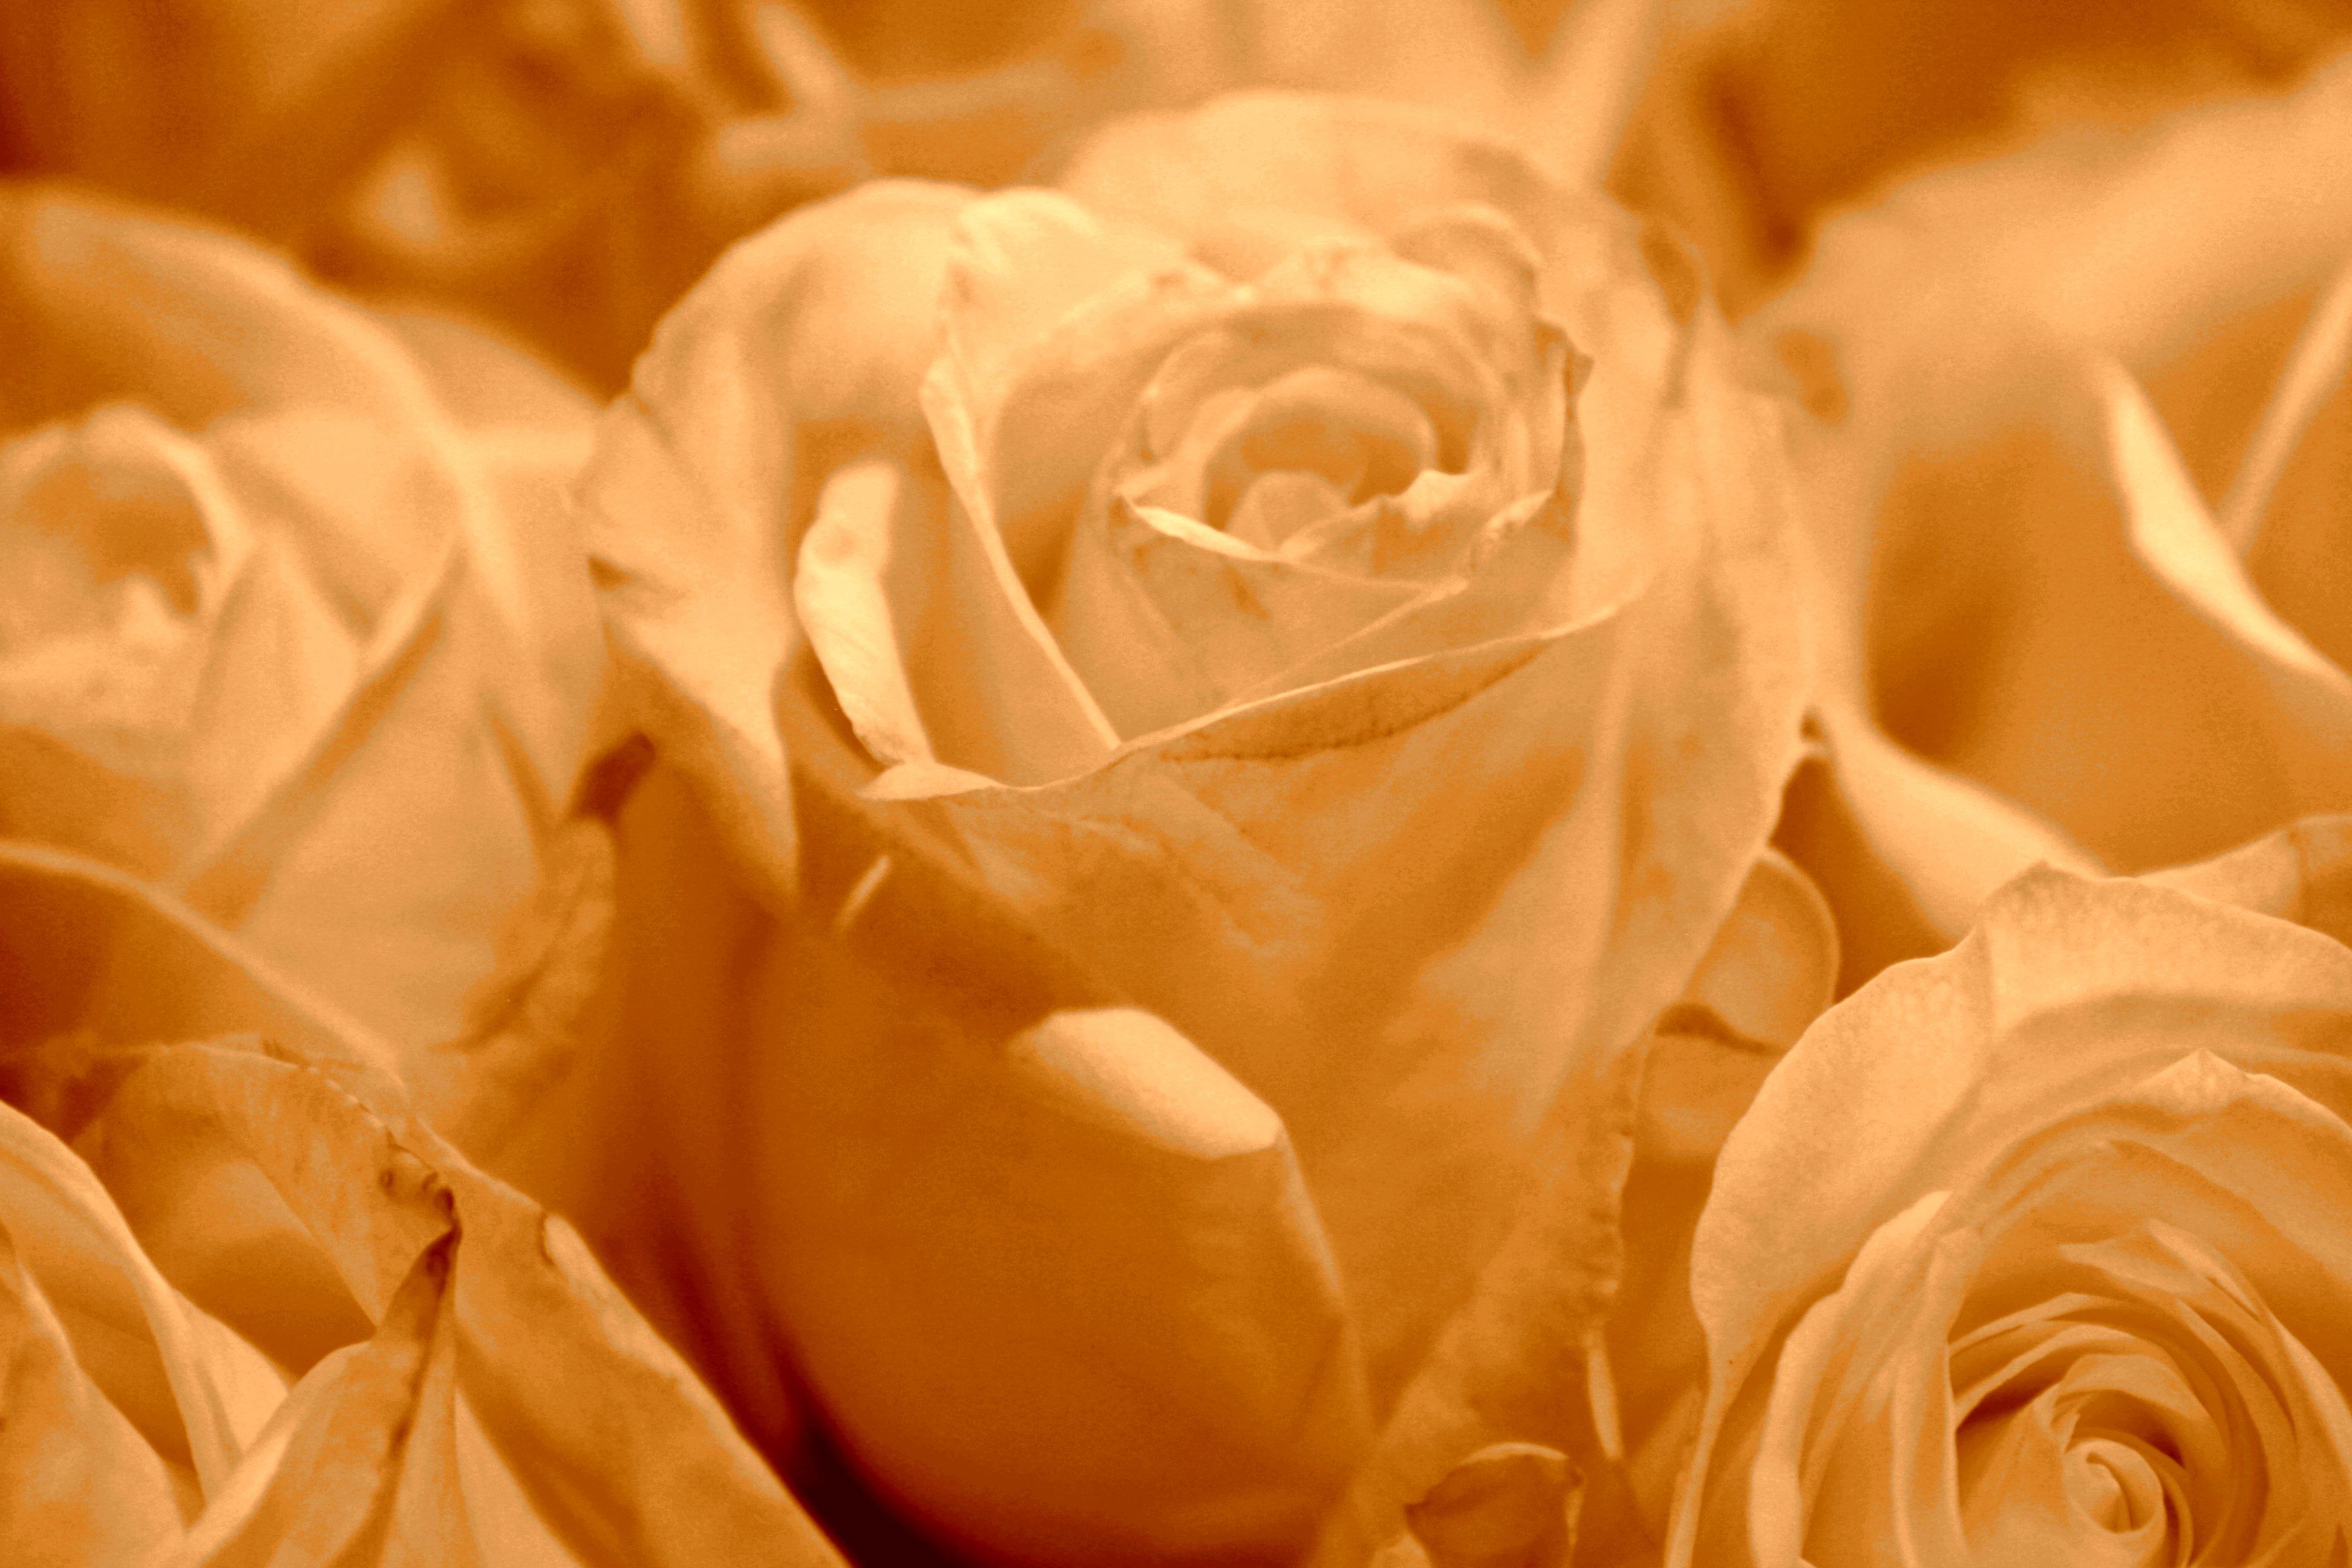 Sepia Tone White Roses Picture Free Photograph Photos